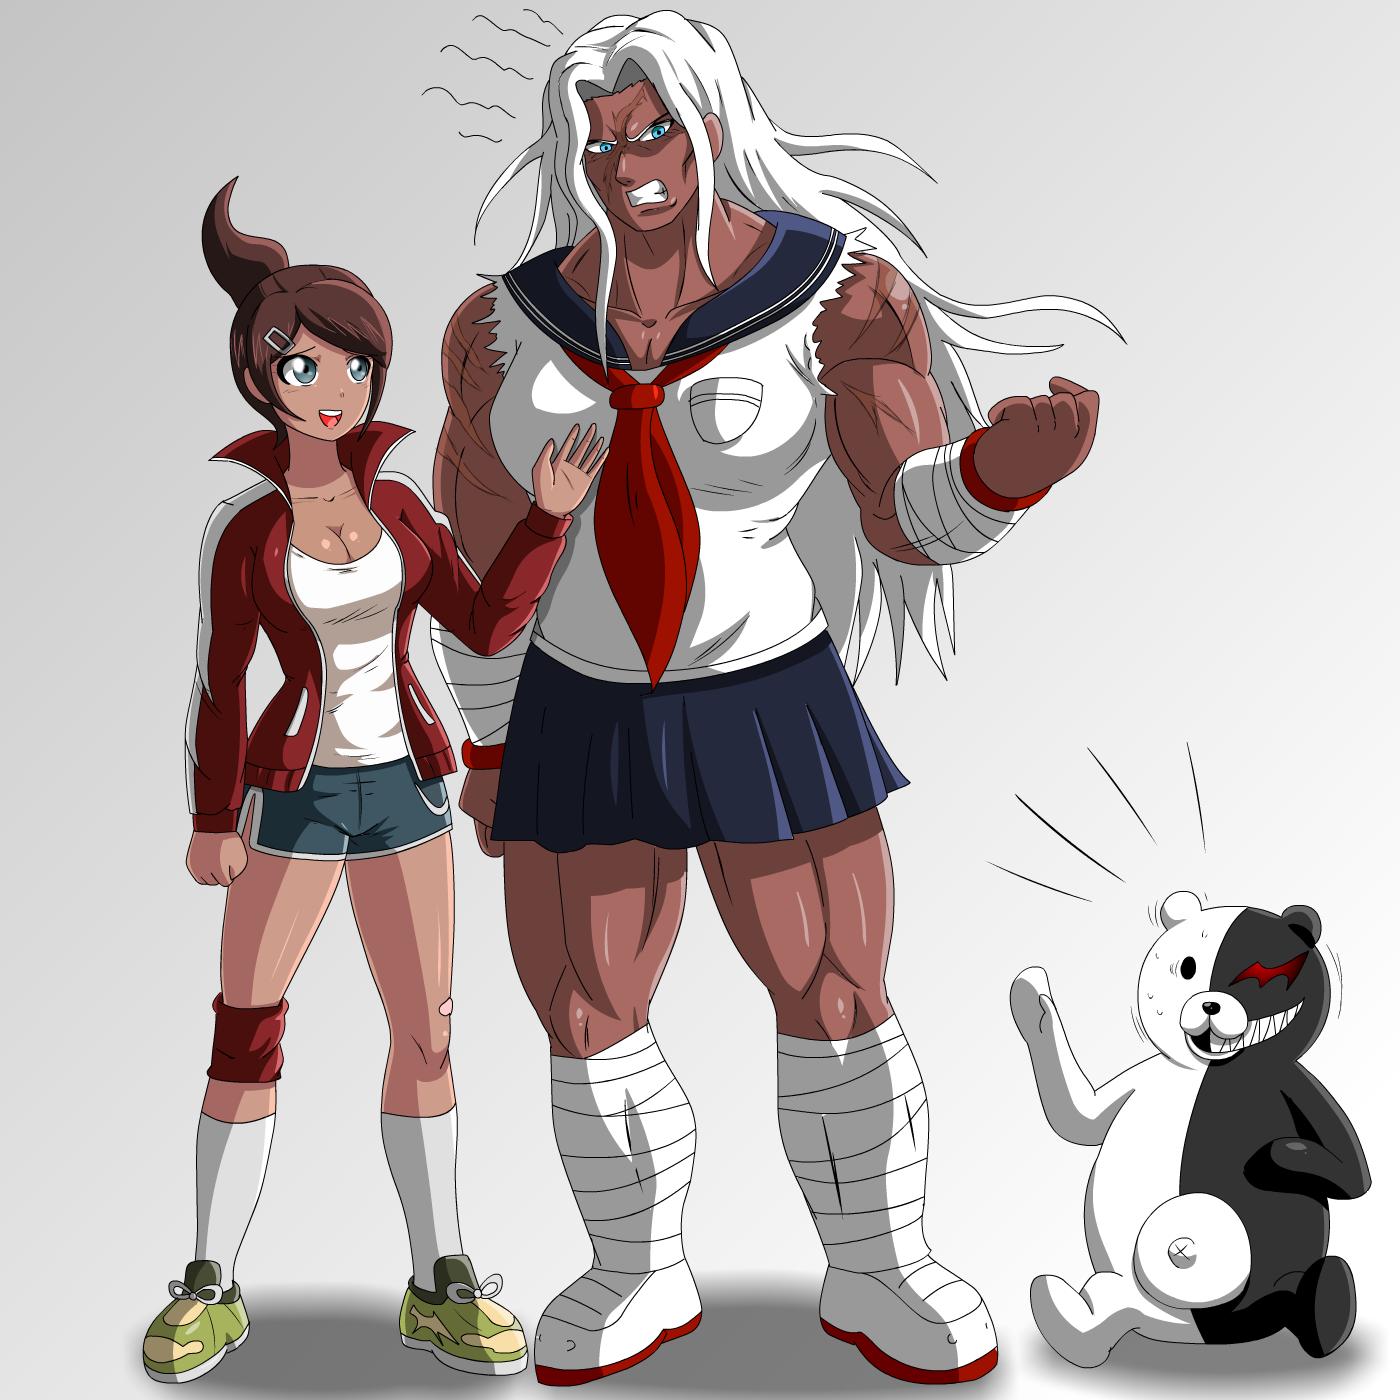 Asahina and oogami